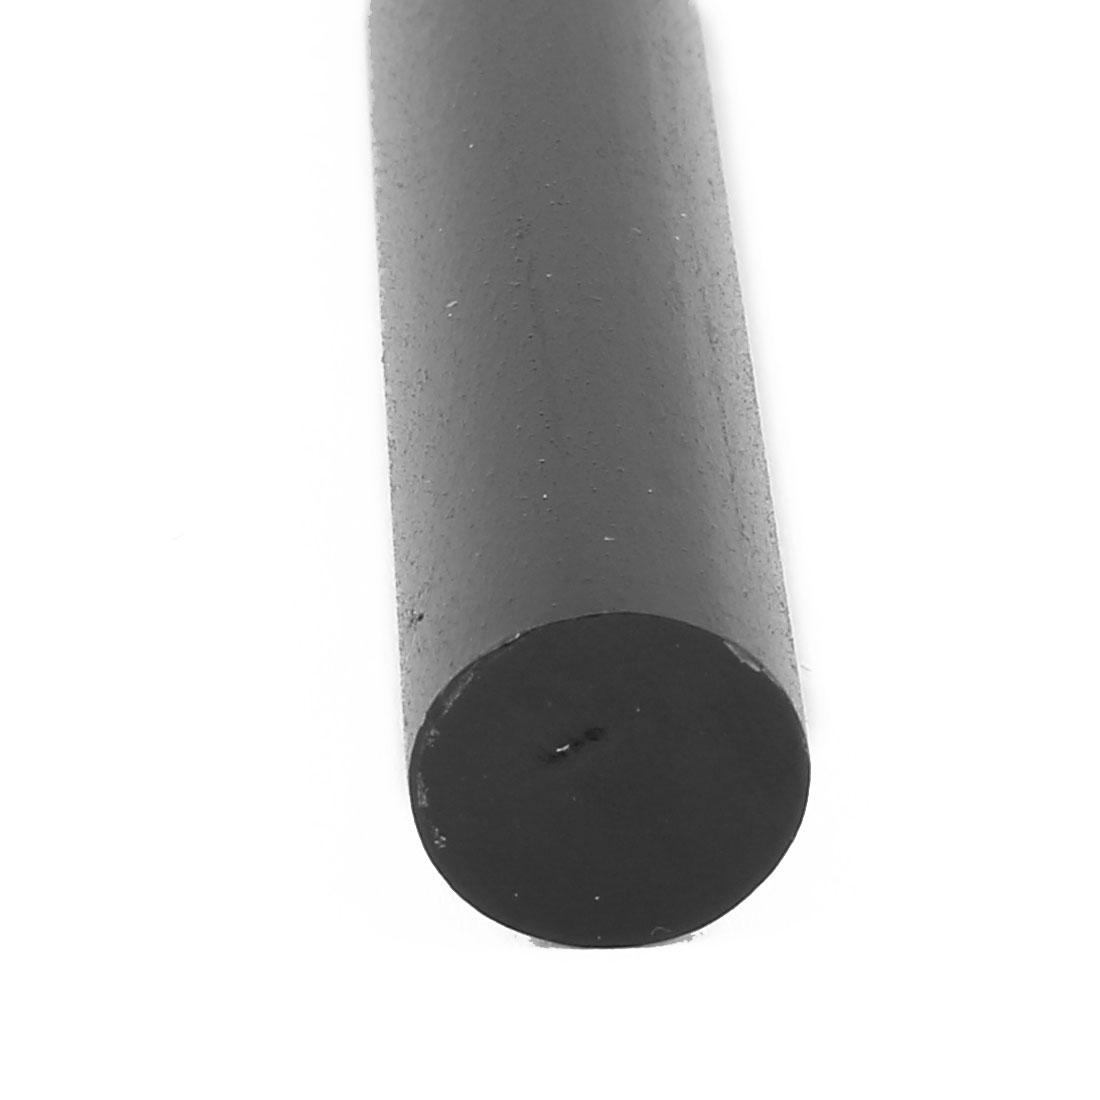 10pcs 11mm x 200mm Black Hot Melt Glue Stick for Electric Tool Hot Melt Glue Gun - image 2 of 3